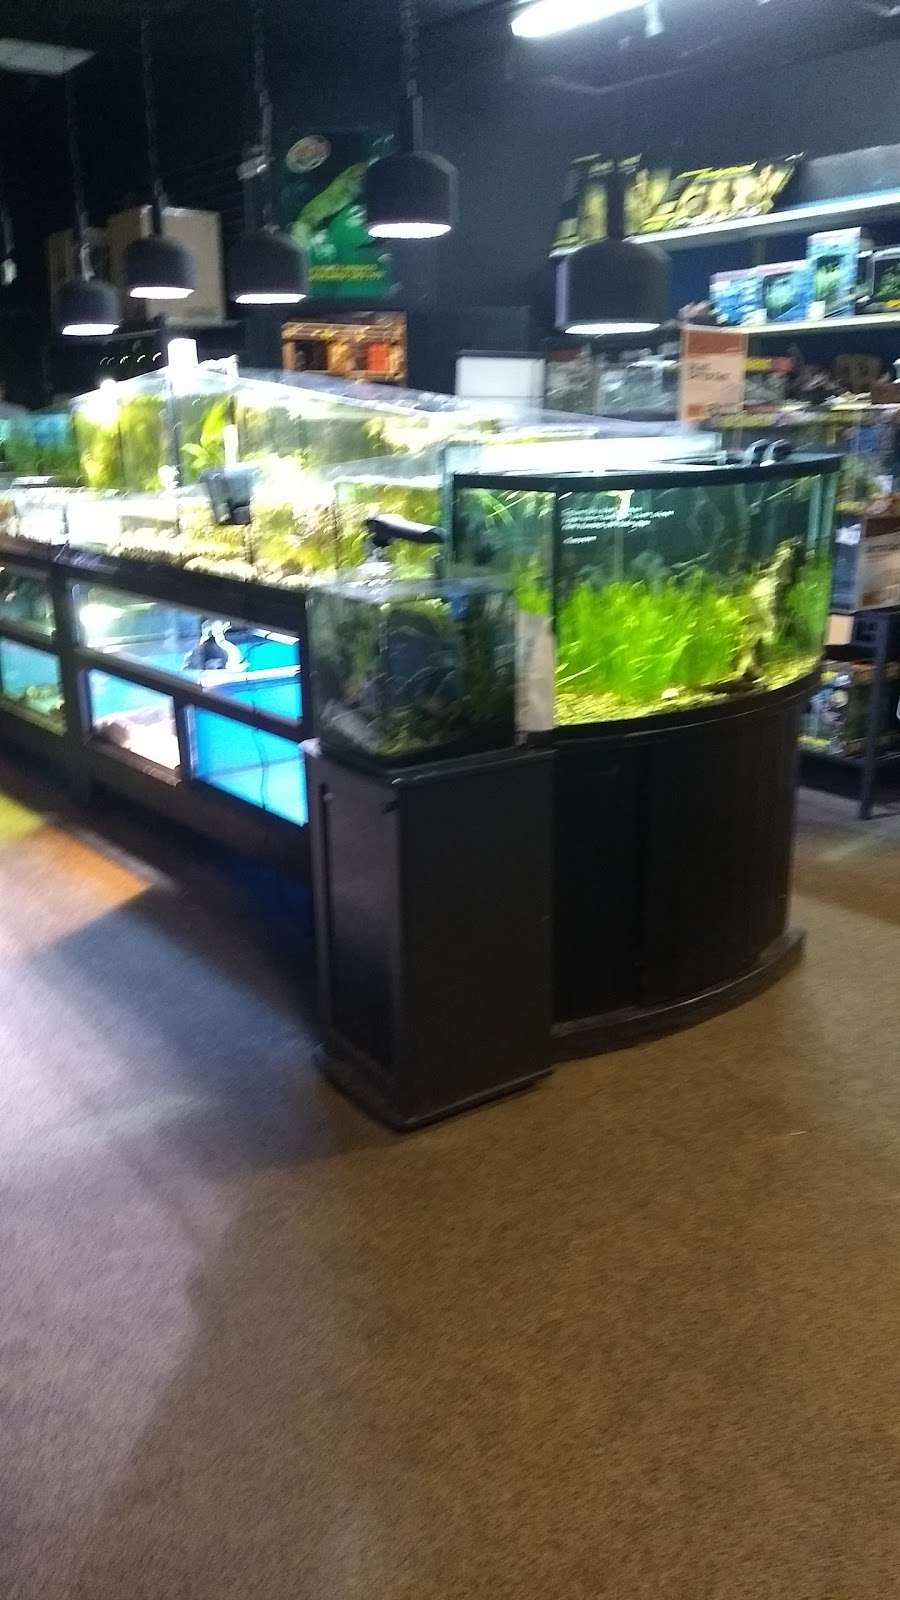 Captain Nemo S Aquarium Superstore 2876 Dekalb Pike Norristown Pa 19401 Usa